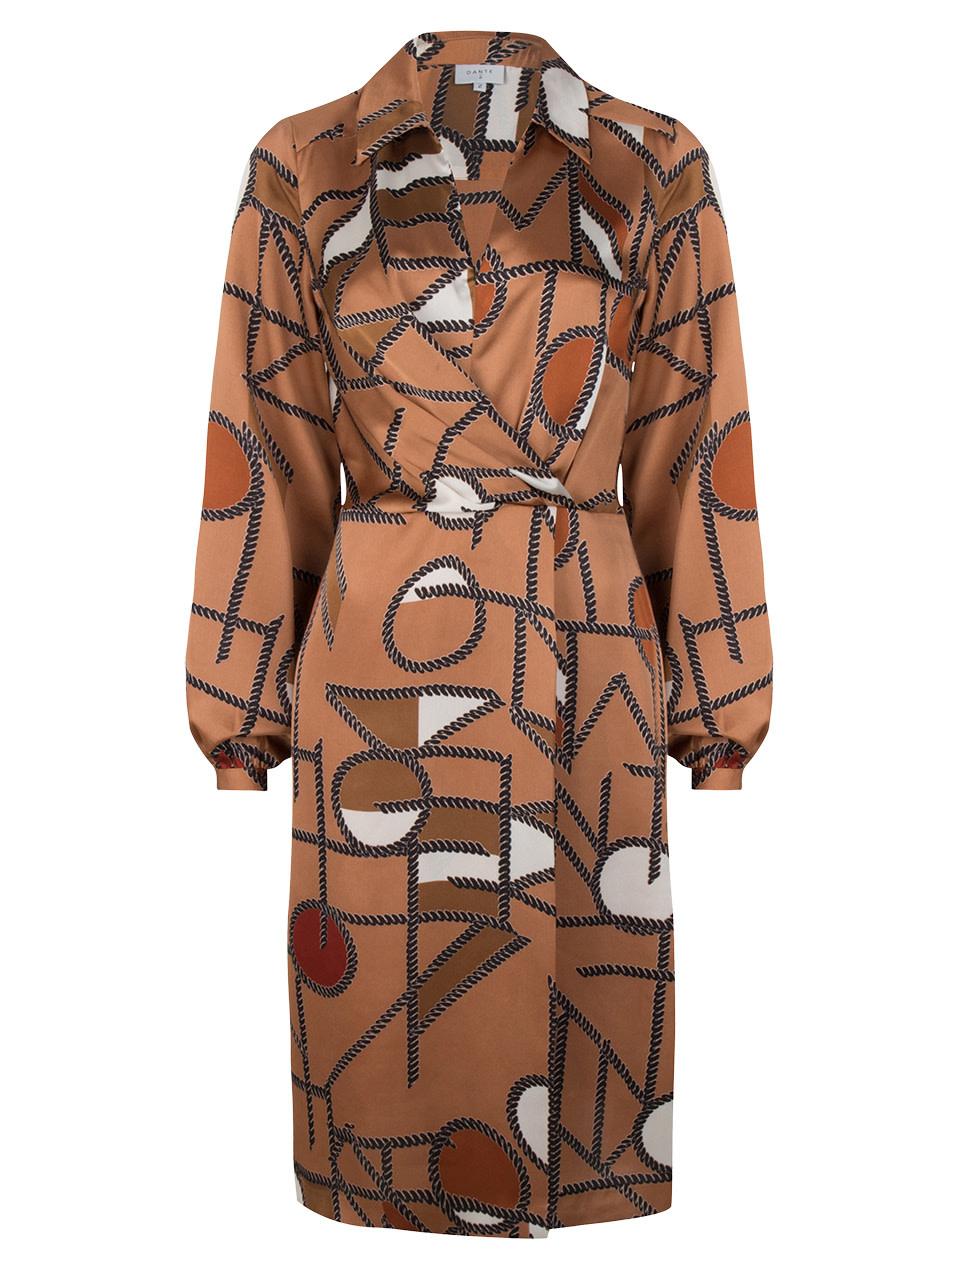 Madison chain print dress long-5